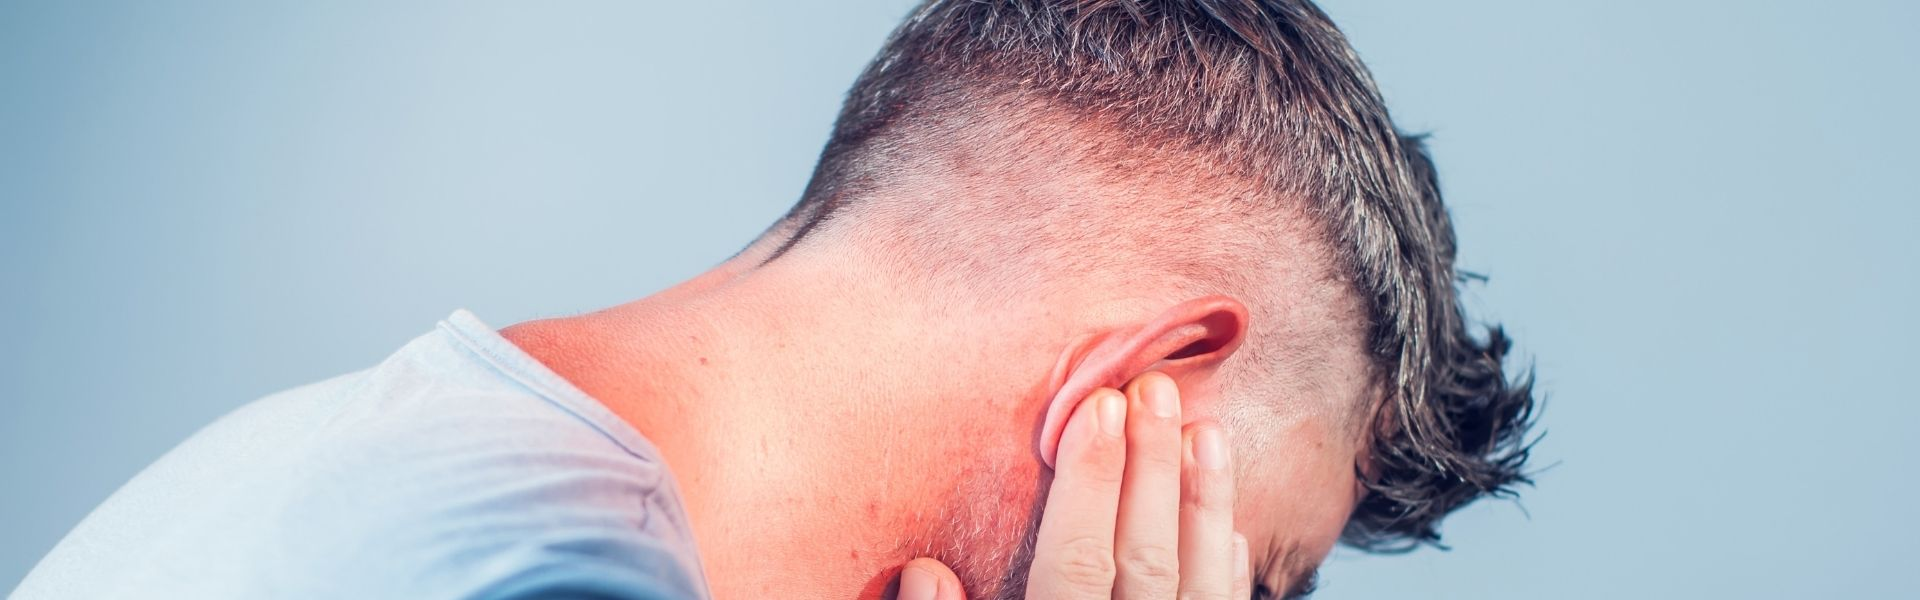 Ear Wax & Your Health